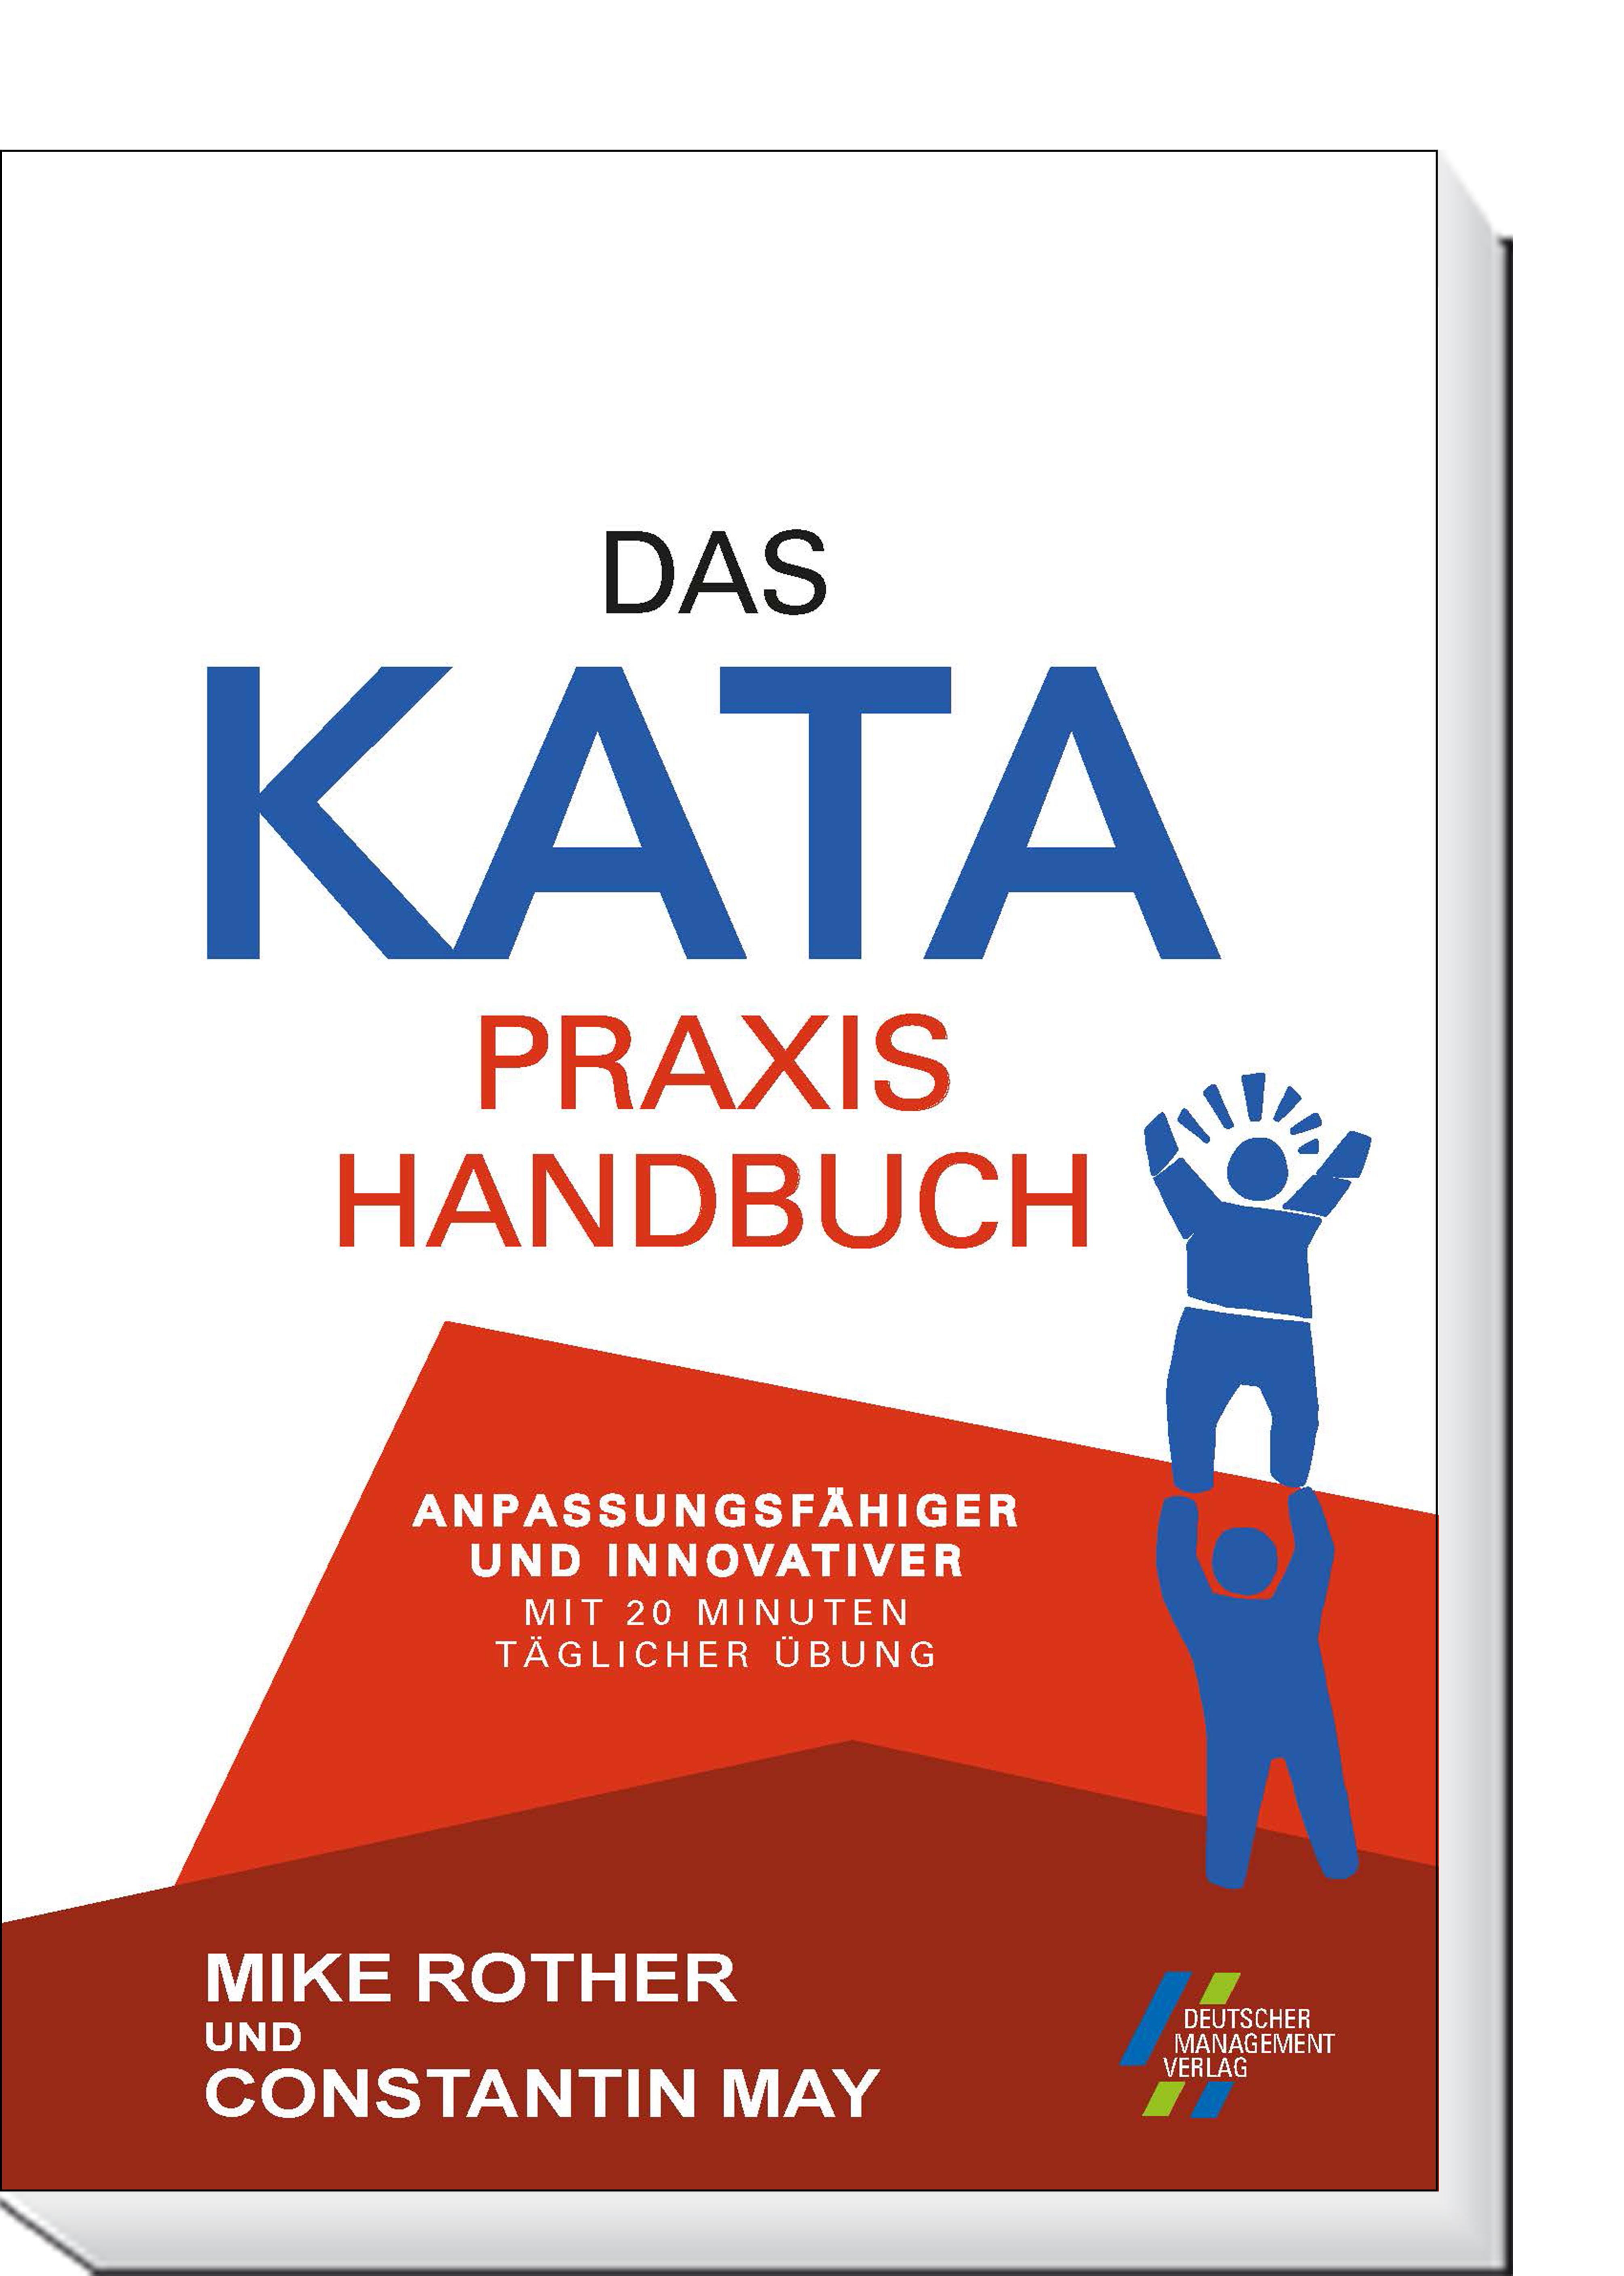 kostenlos KATA-Praxishandbuch Hörbuch 1. Teil